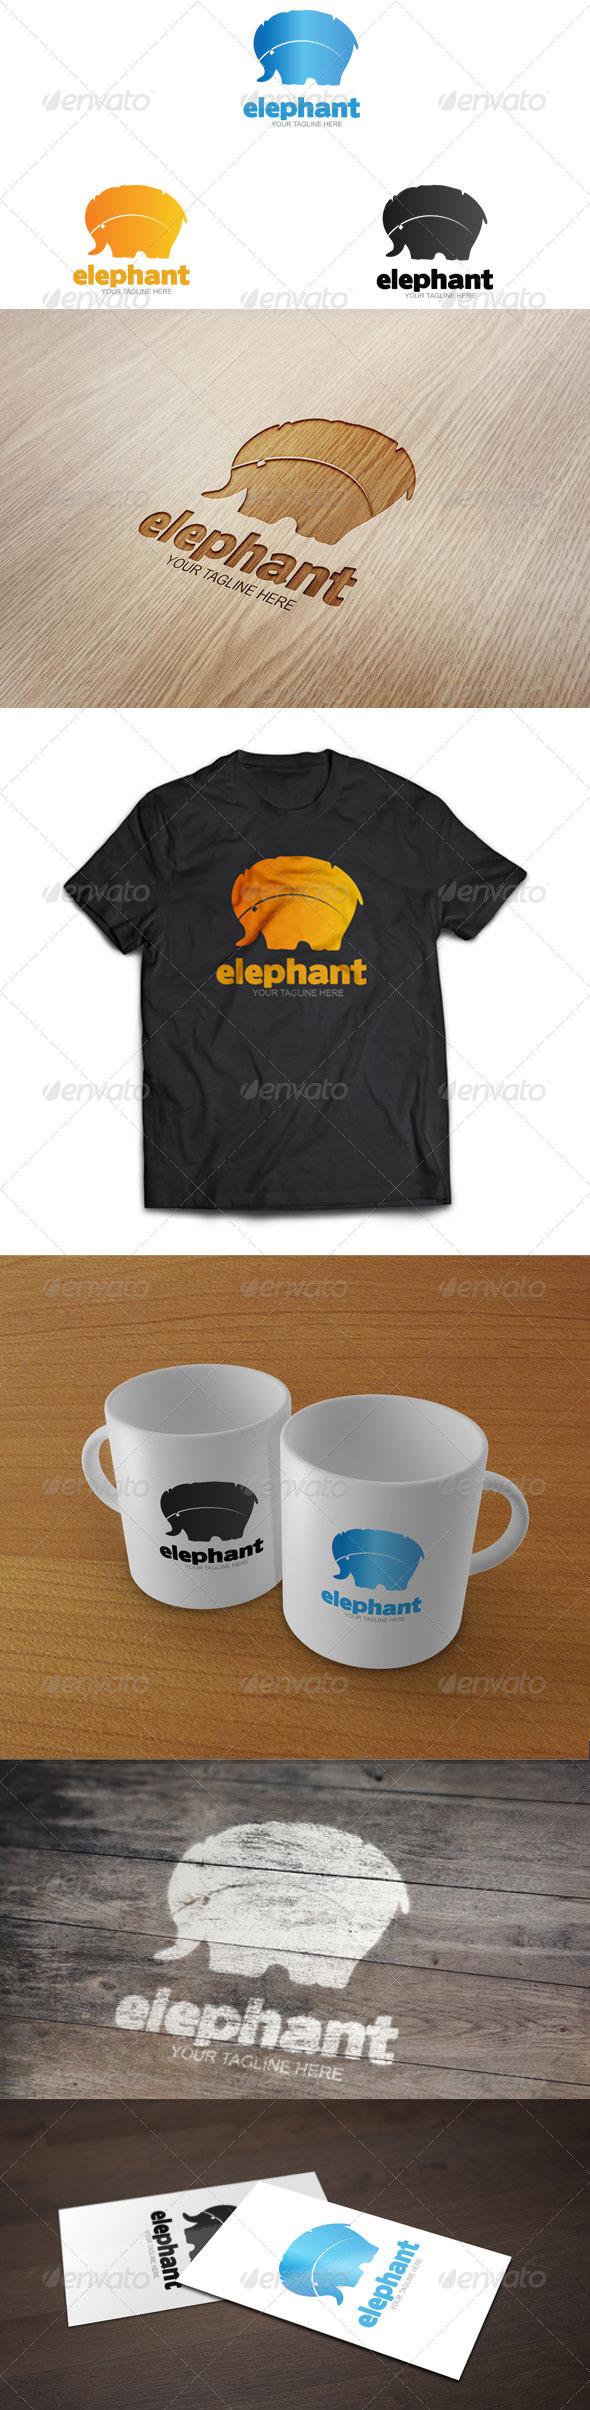 Elephant - Logo Template - Animals Logo Templates